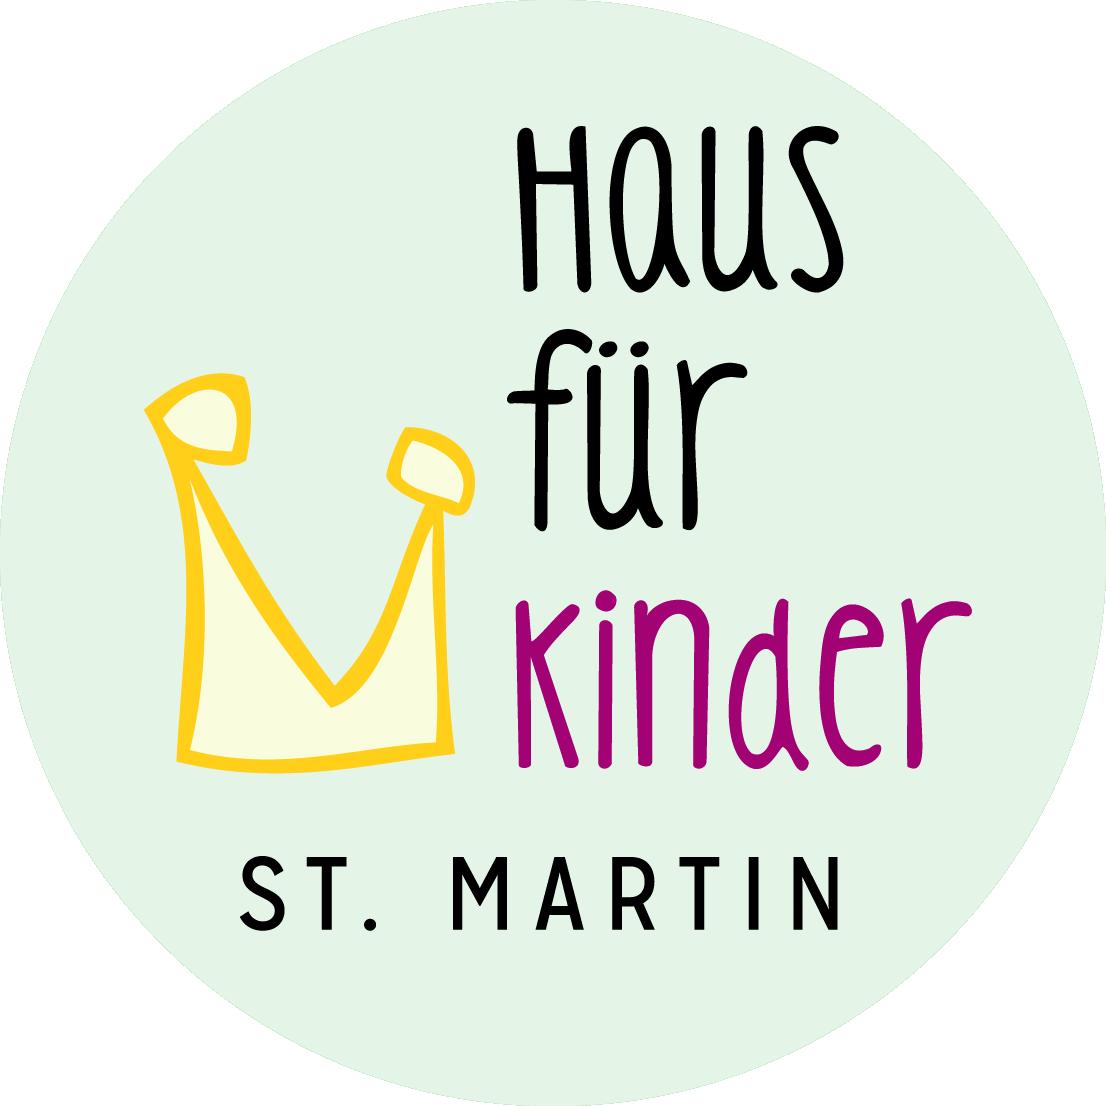 Kindergarten St. Martin in Waldbüttelbrunn Logo